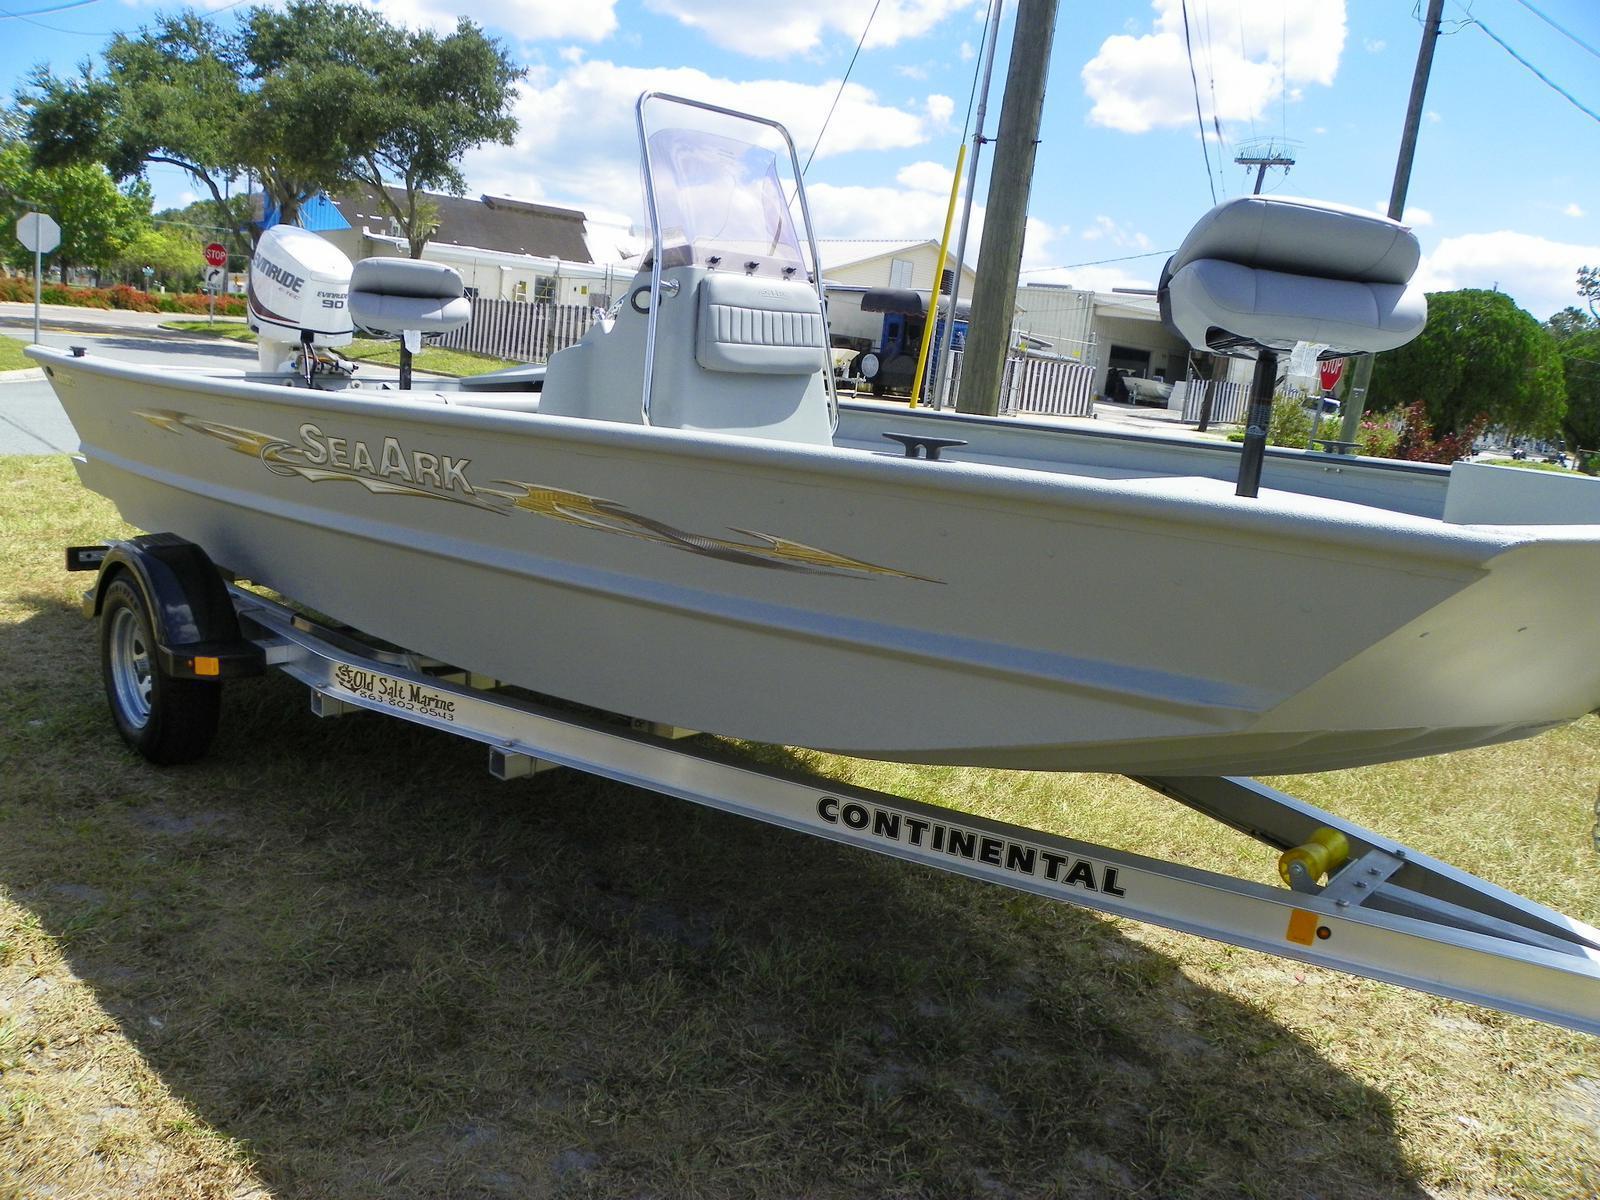 SeaArk RXT 872